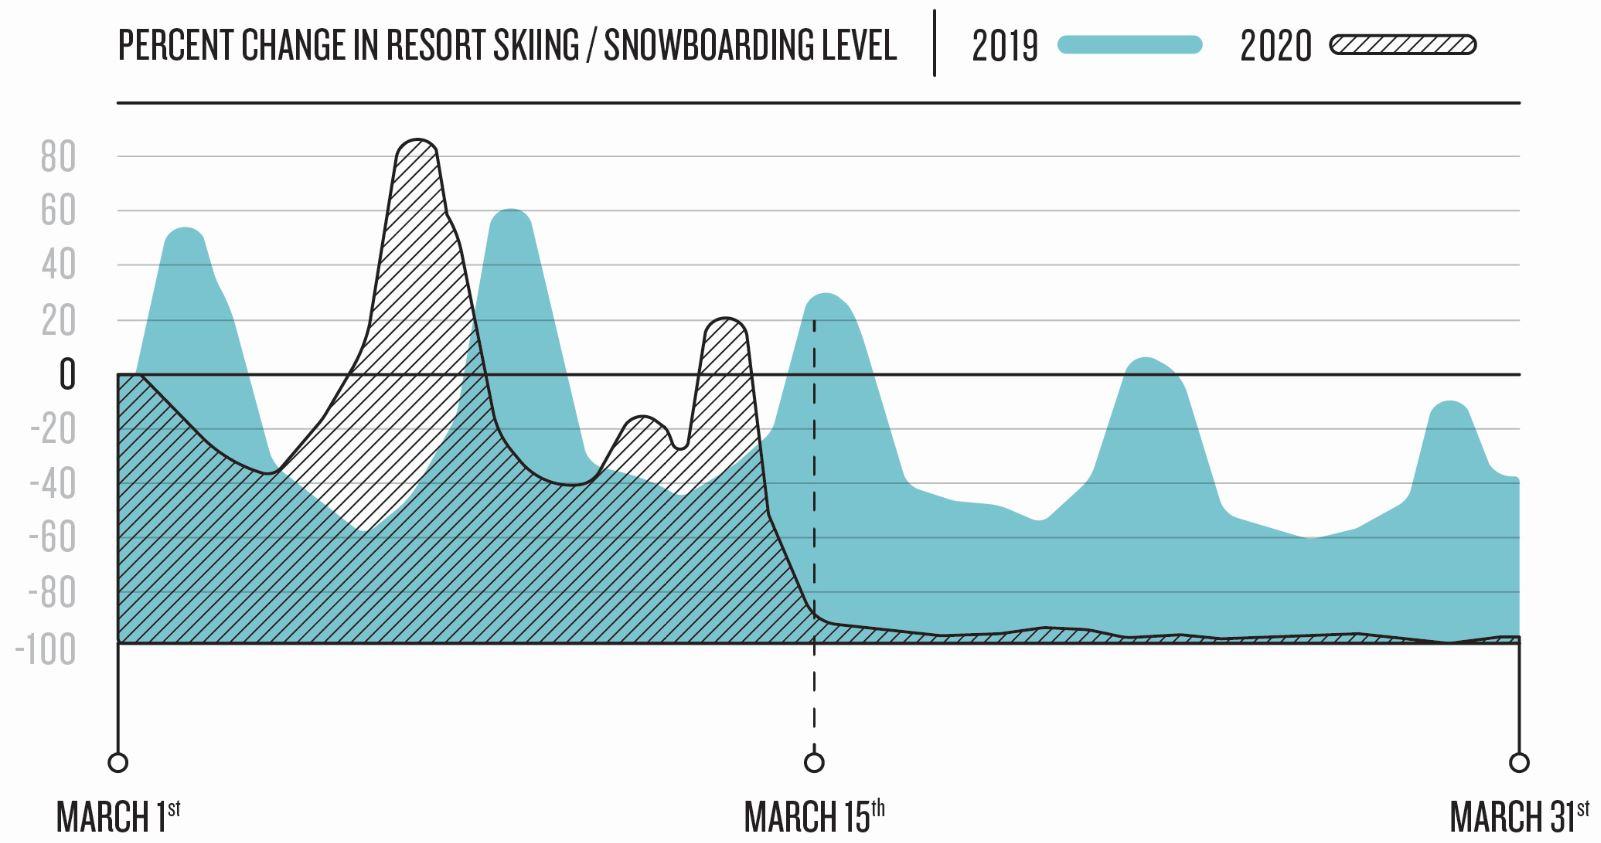 SkiSnowboarding